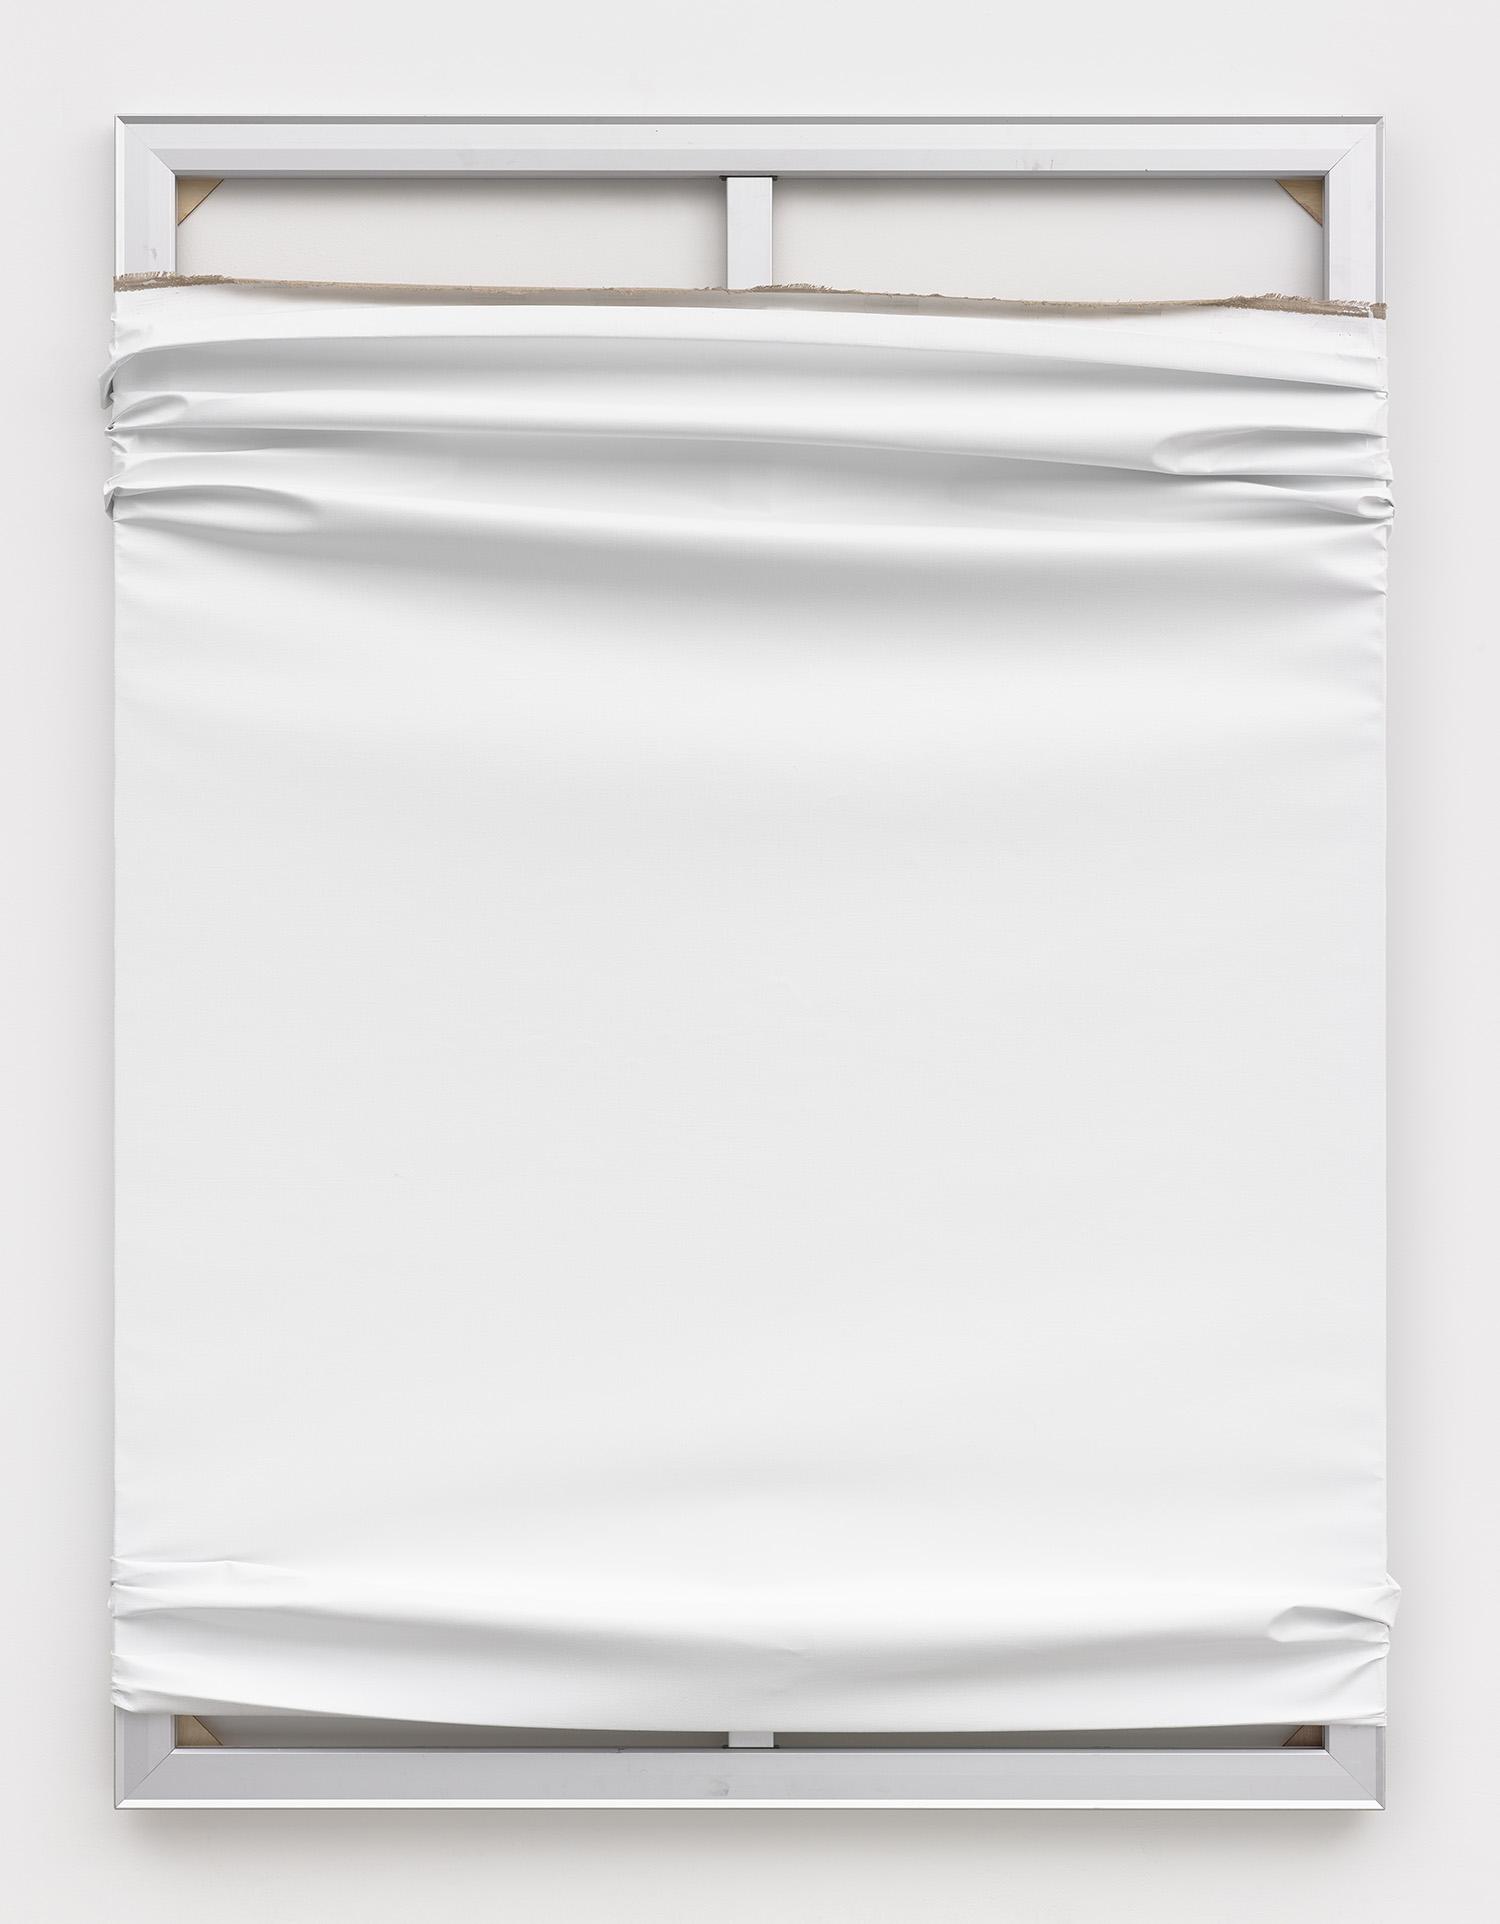 INTERVIEWS Archivi • XIBT Contemporary Art Mag